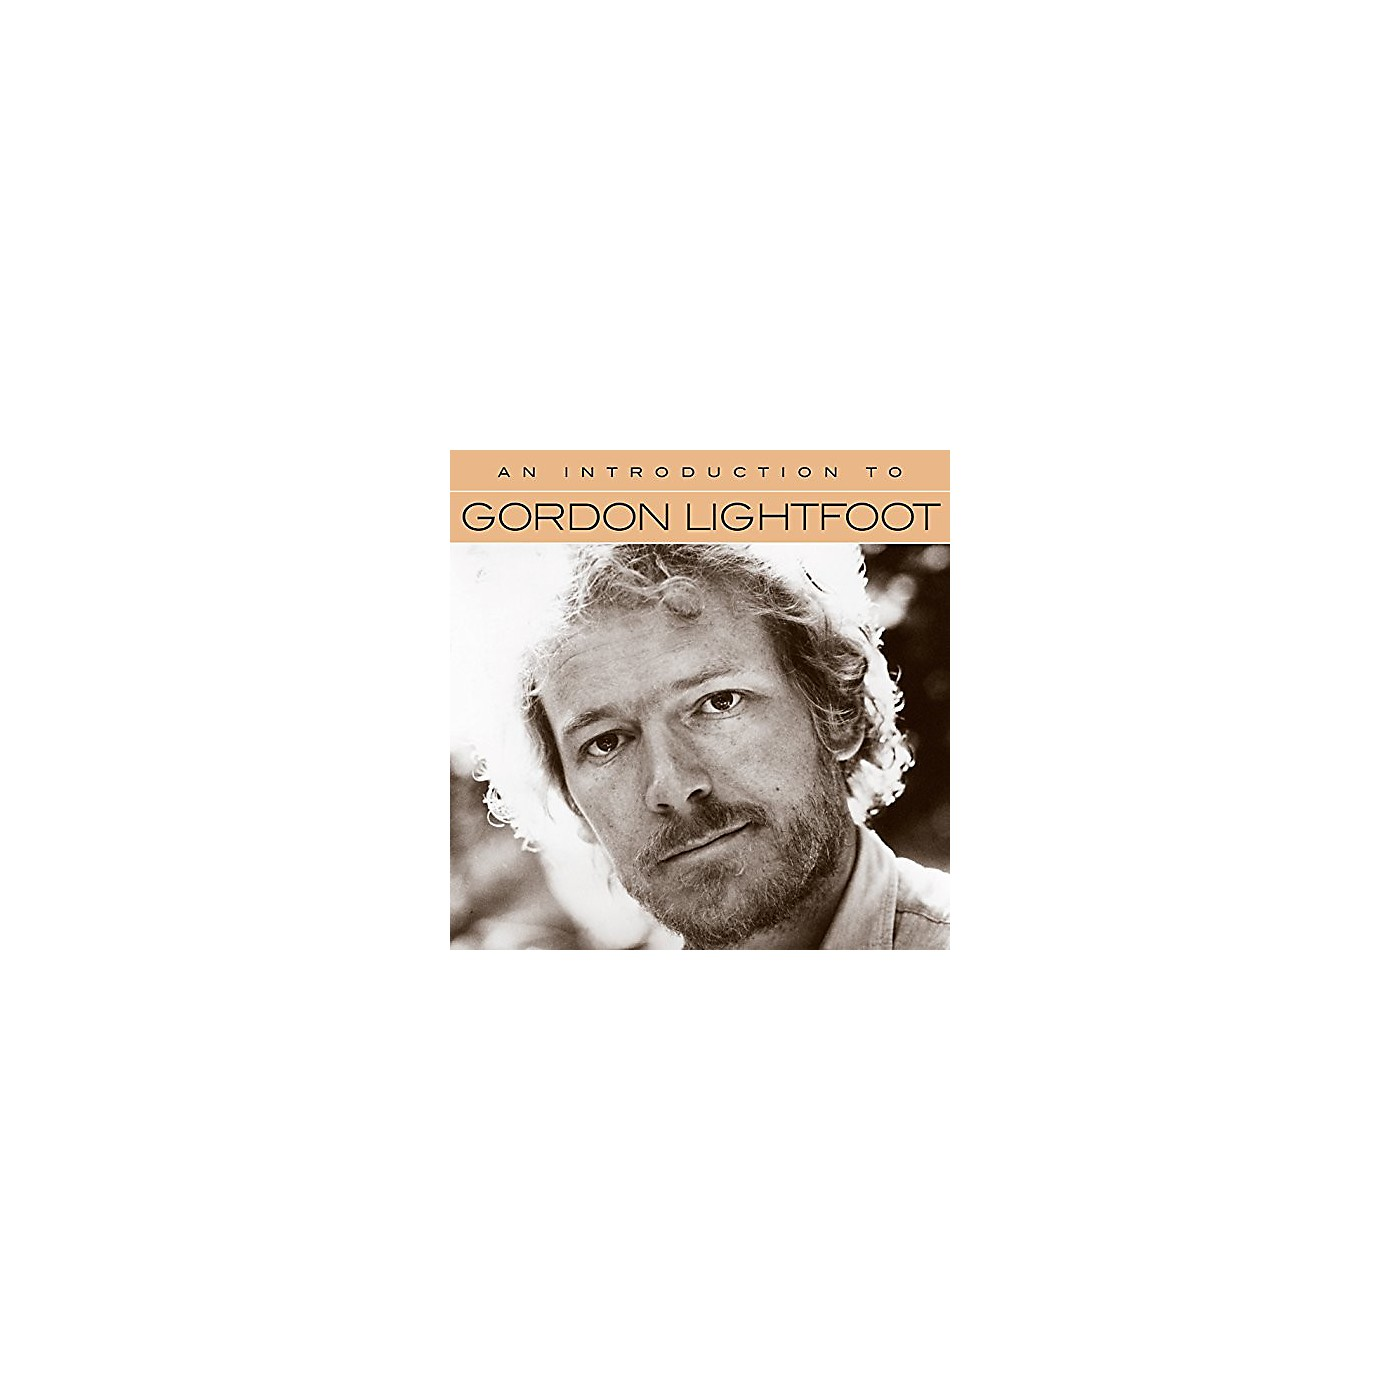 Alliance Gordon Lightfoot - An Introduction To (CD) thumbnail